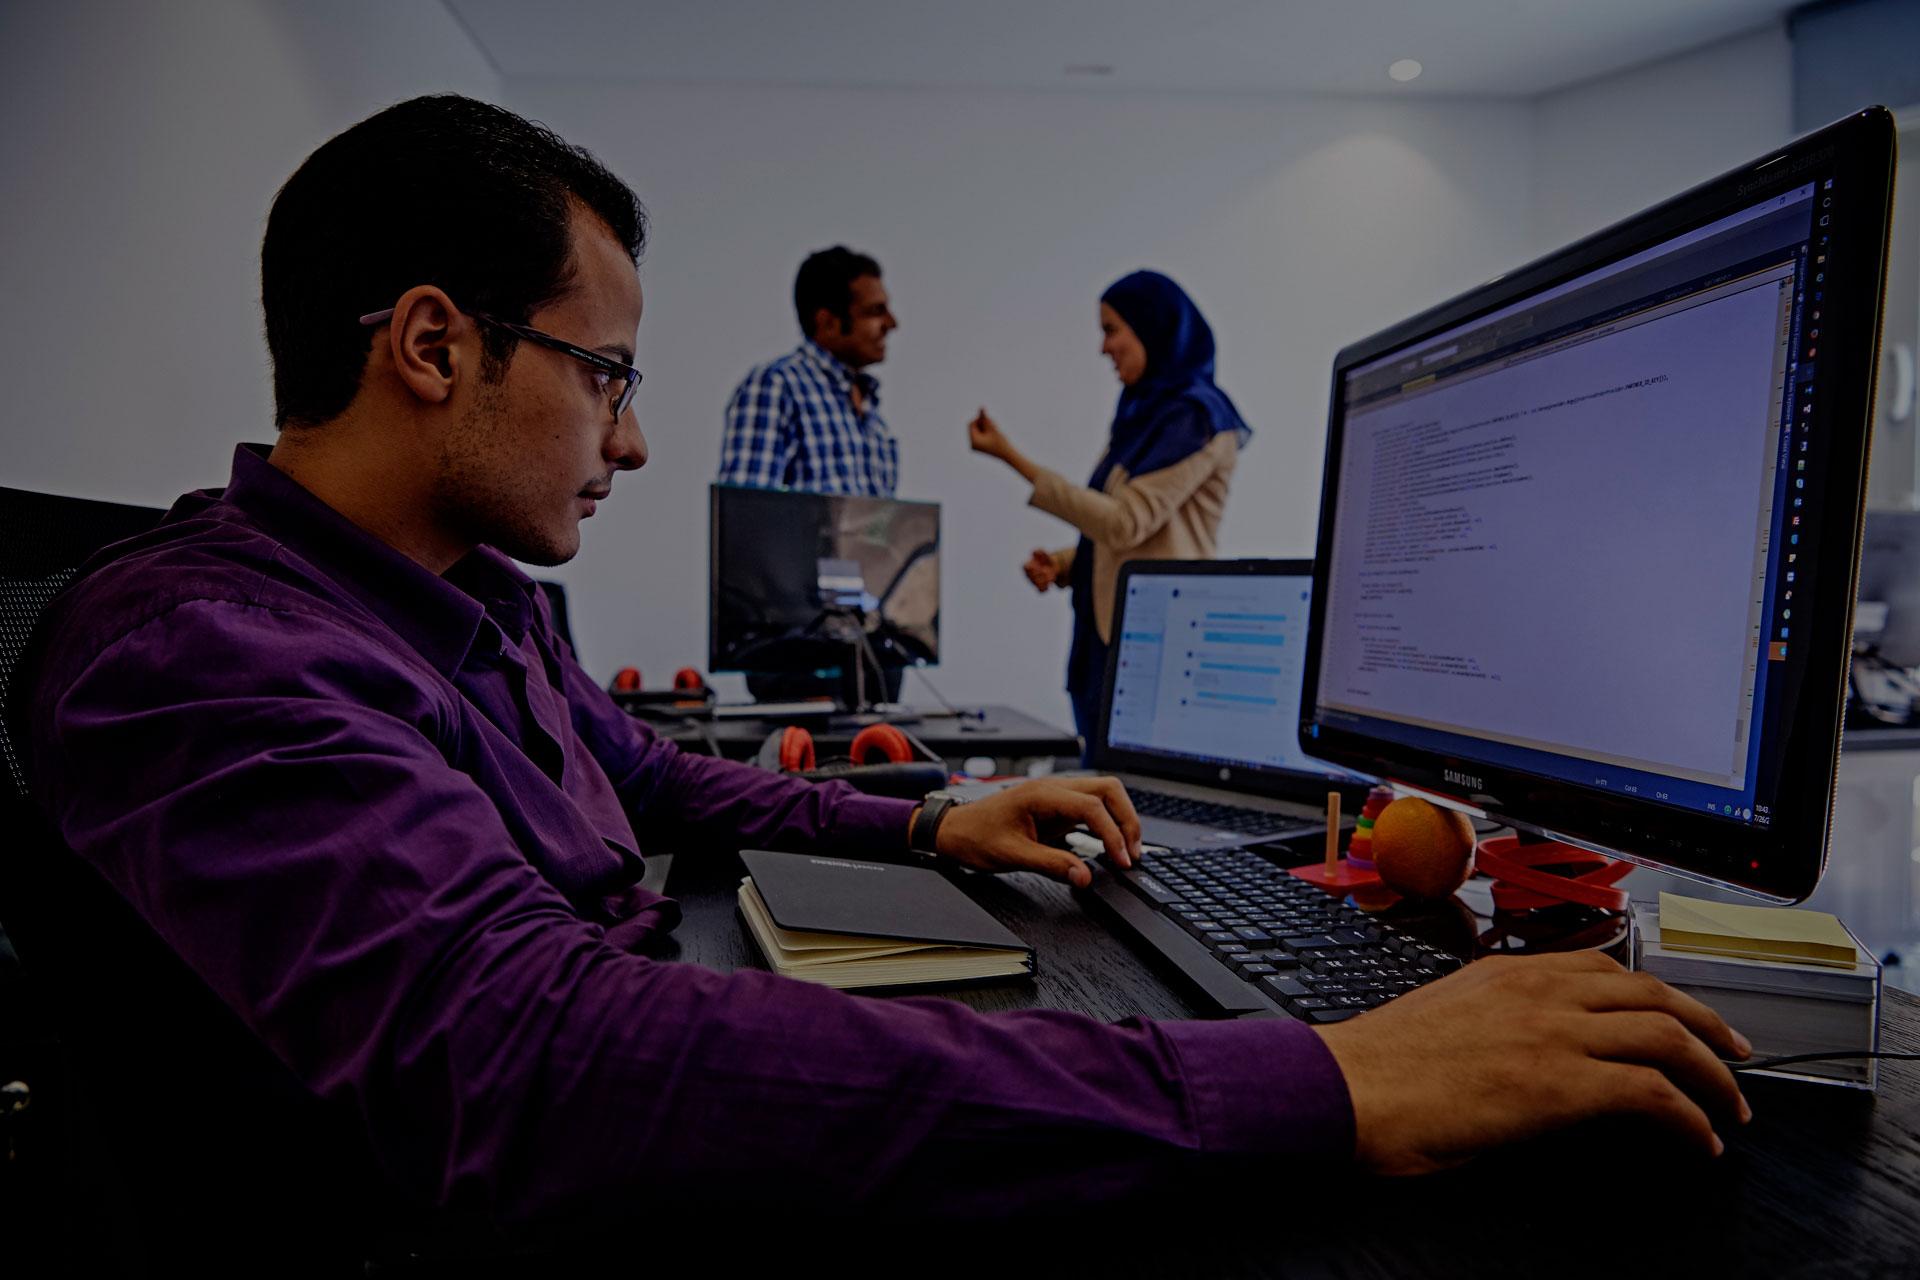 Web-Cairo-developer-computer